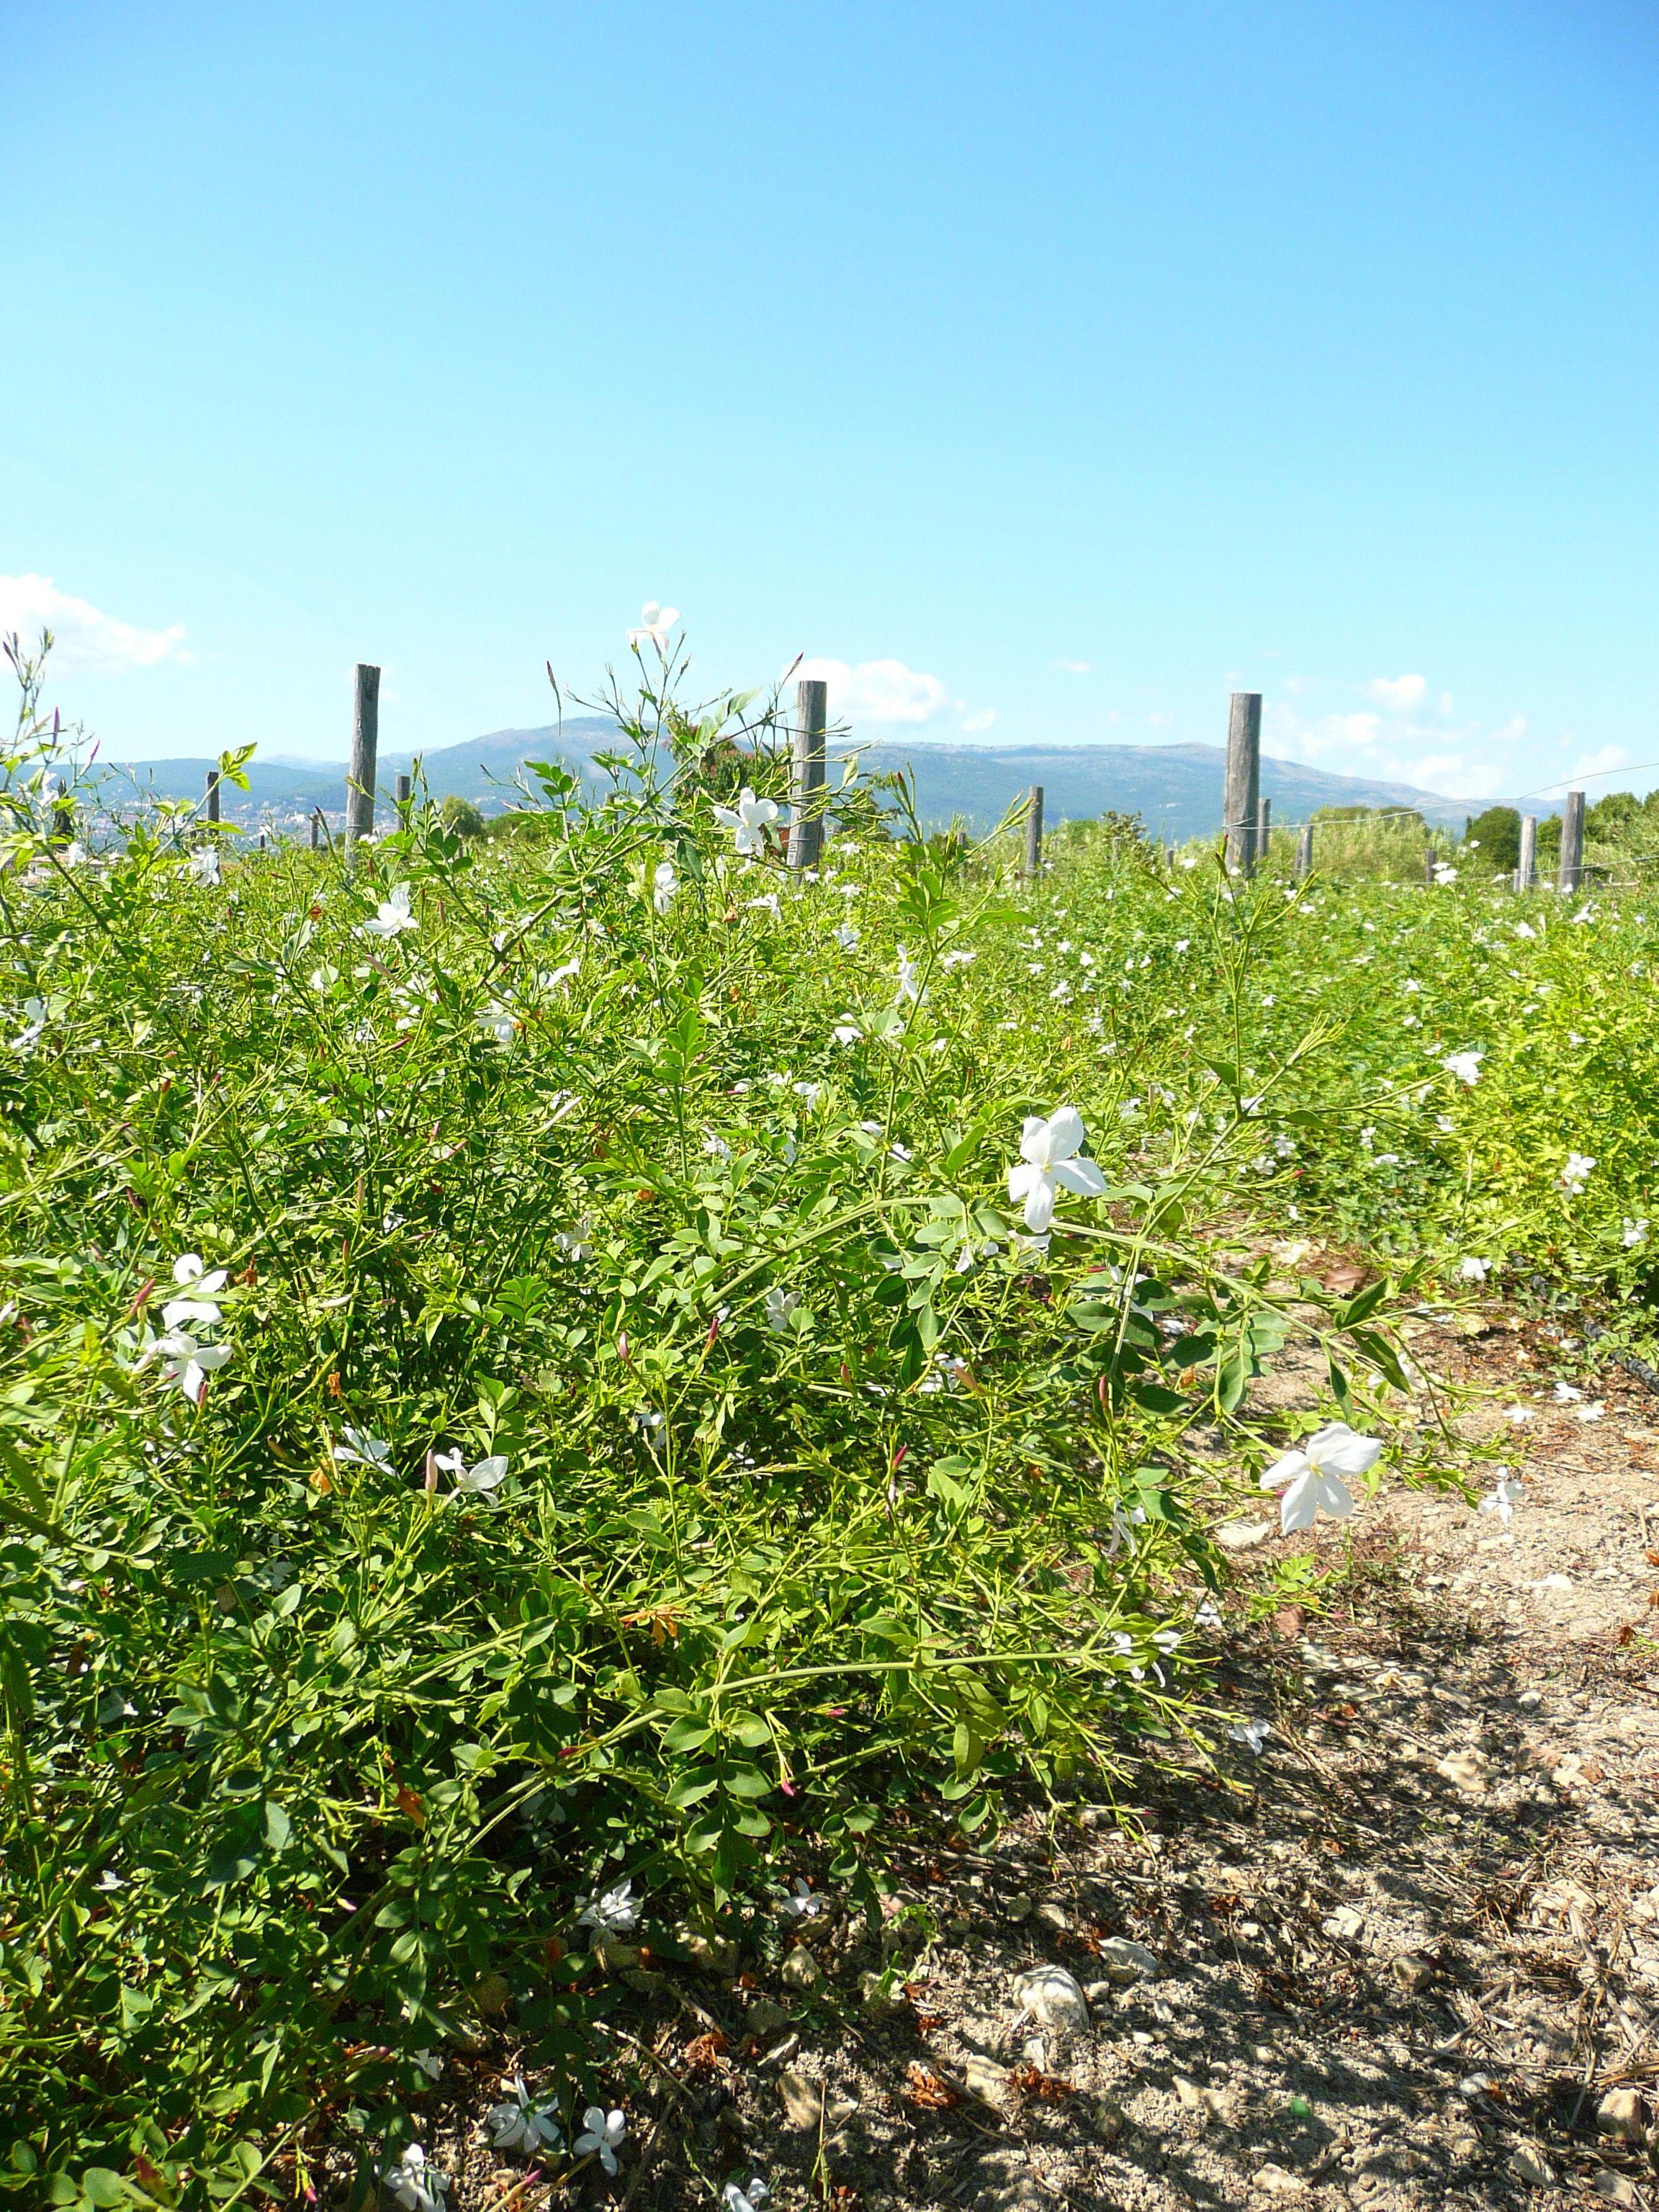 Champs de jasmin à Grasse Jasmine field in Grasse | About perfume ...